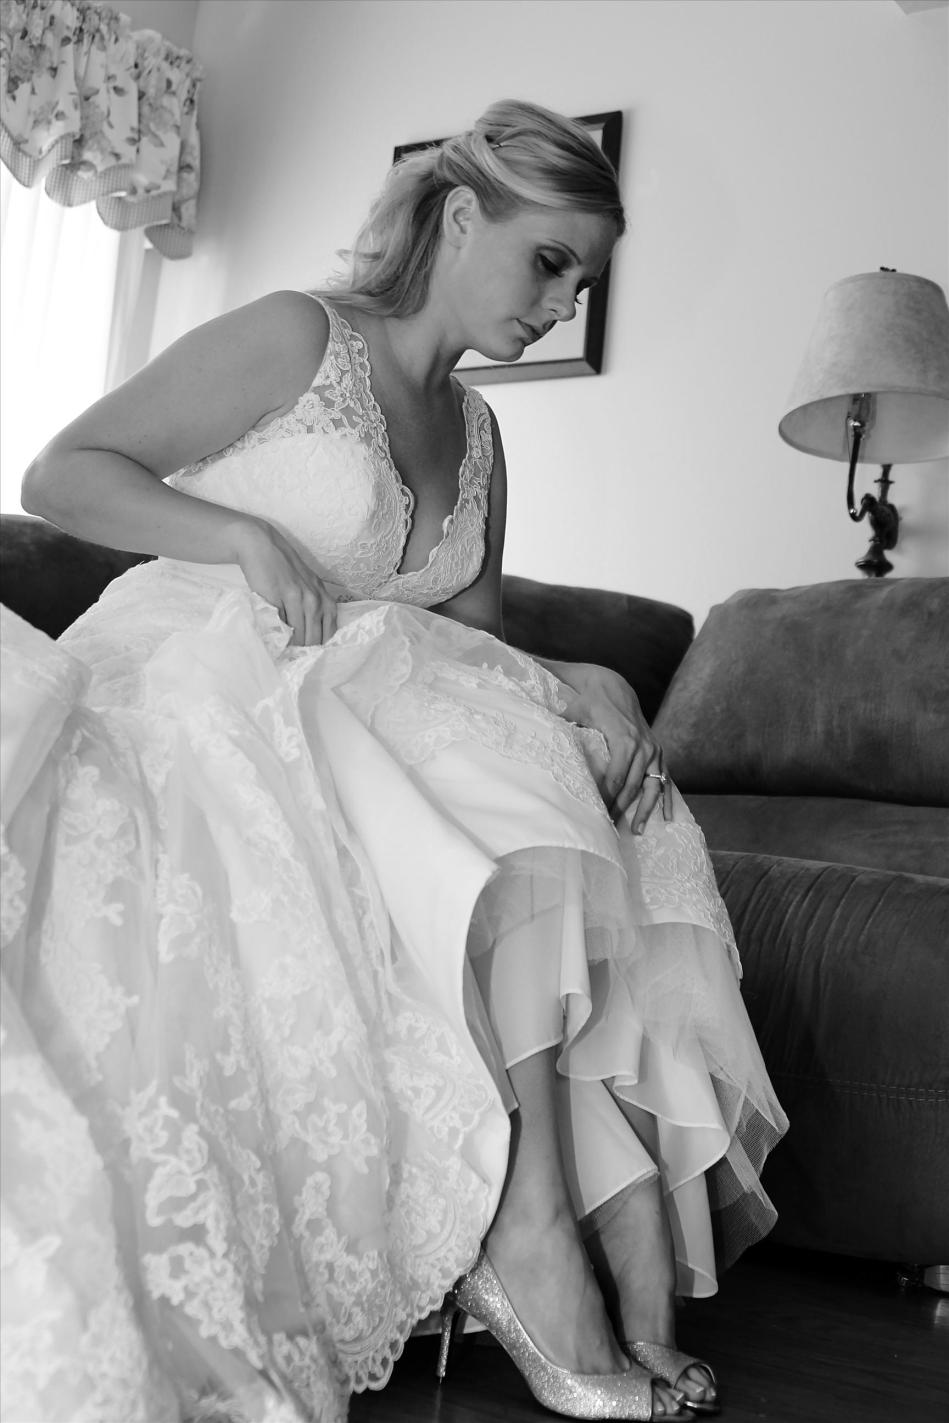 bridalprep.bridesdress.weddingphotos.apicturesquememoryphotography